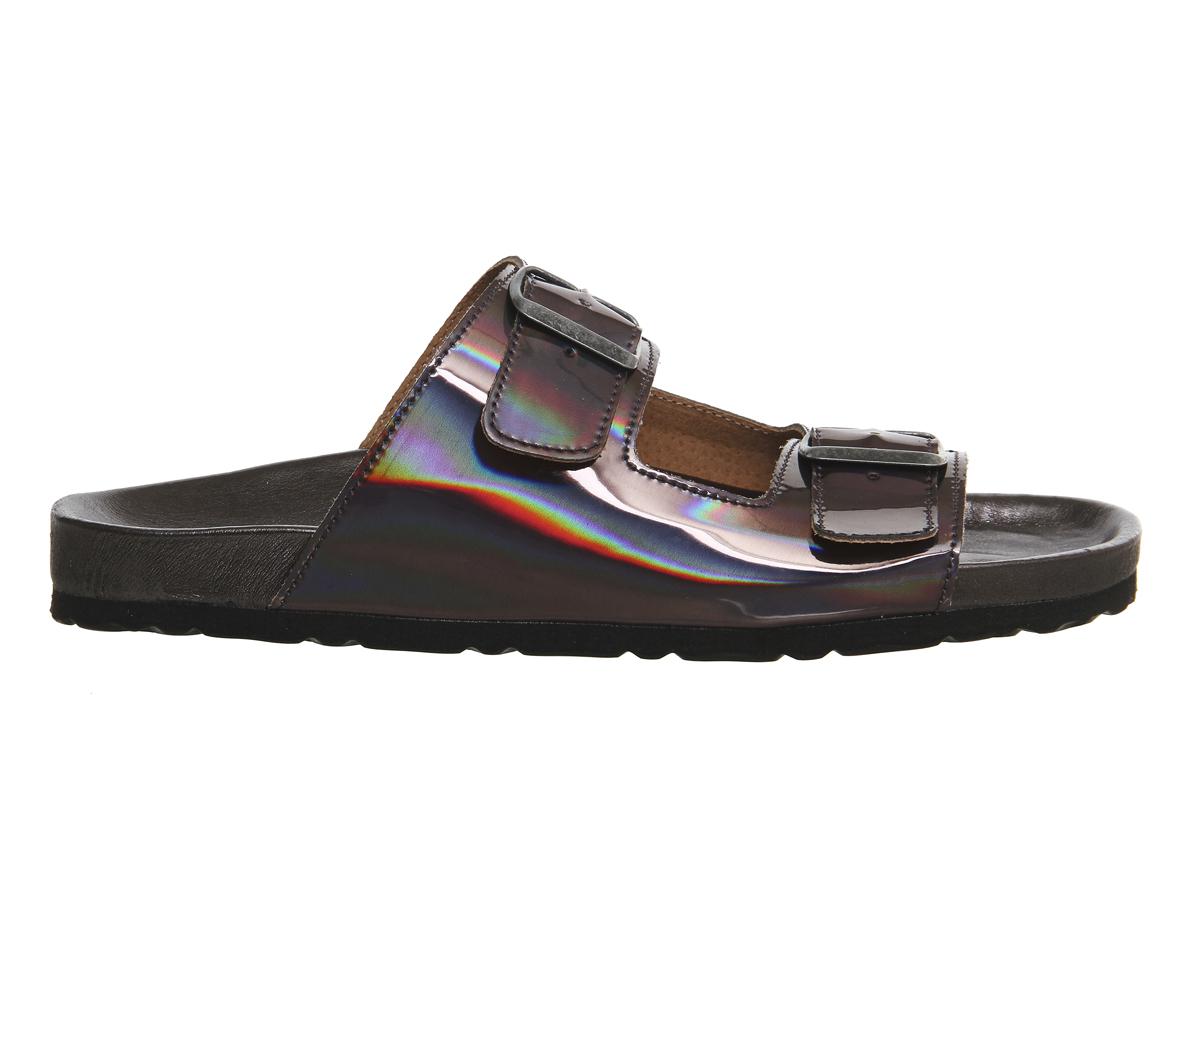 Lyst Office Marbella Buckle Sandals In Metallic For Men